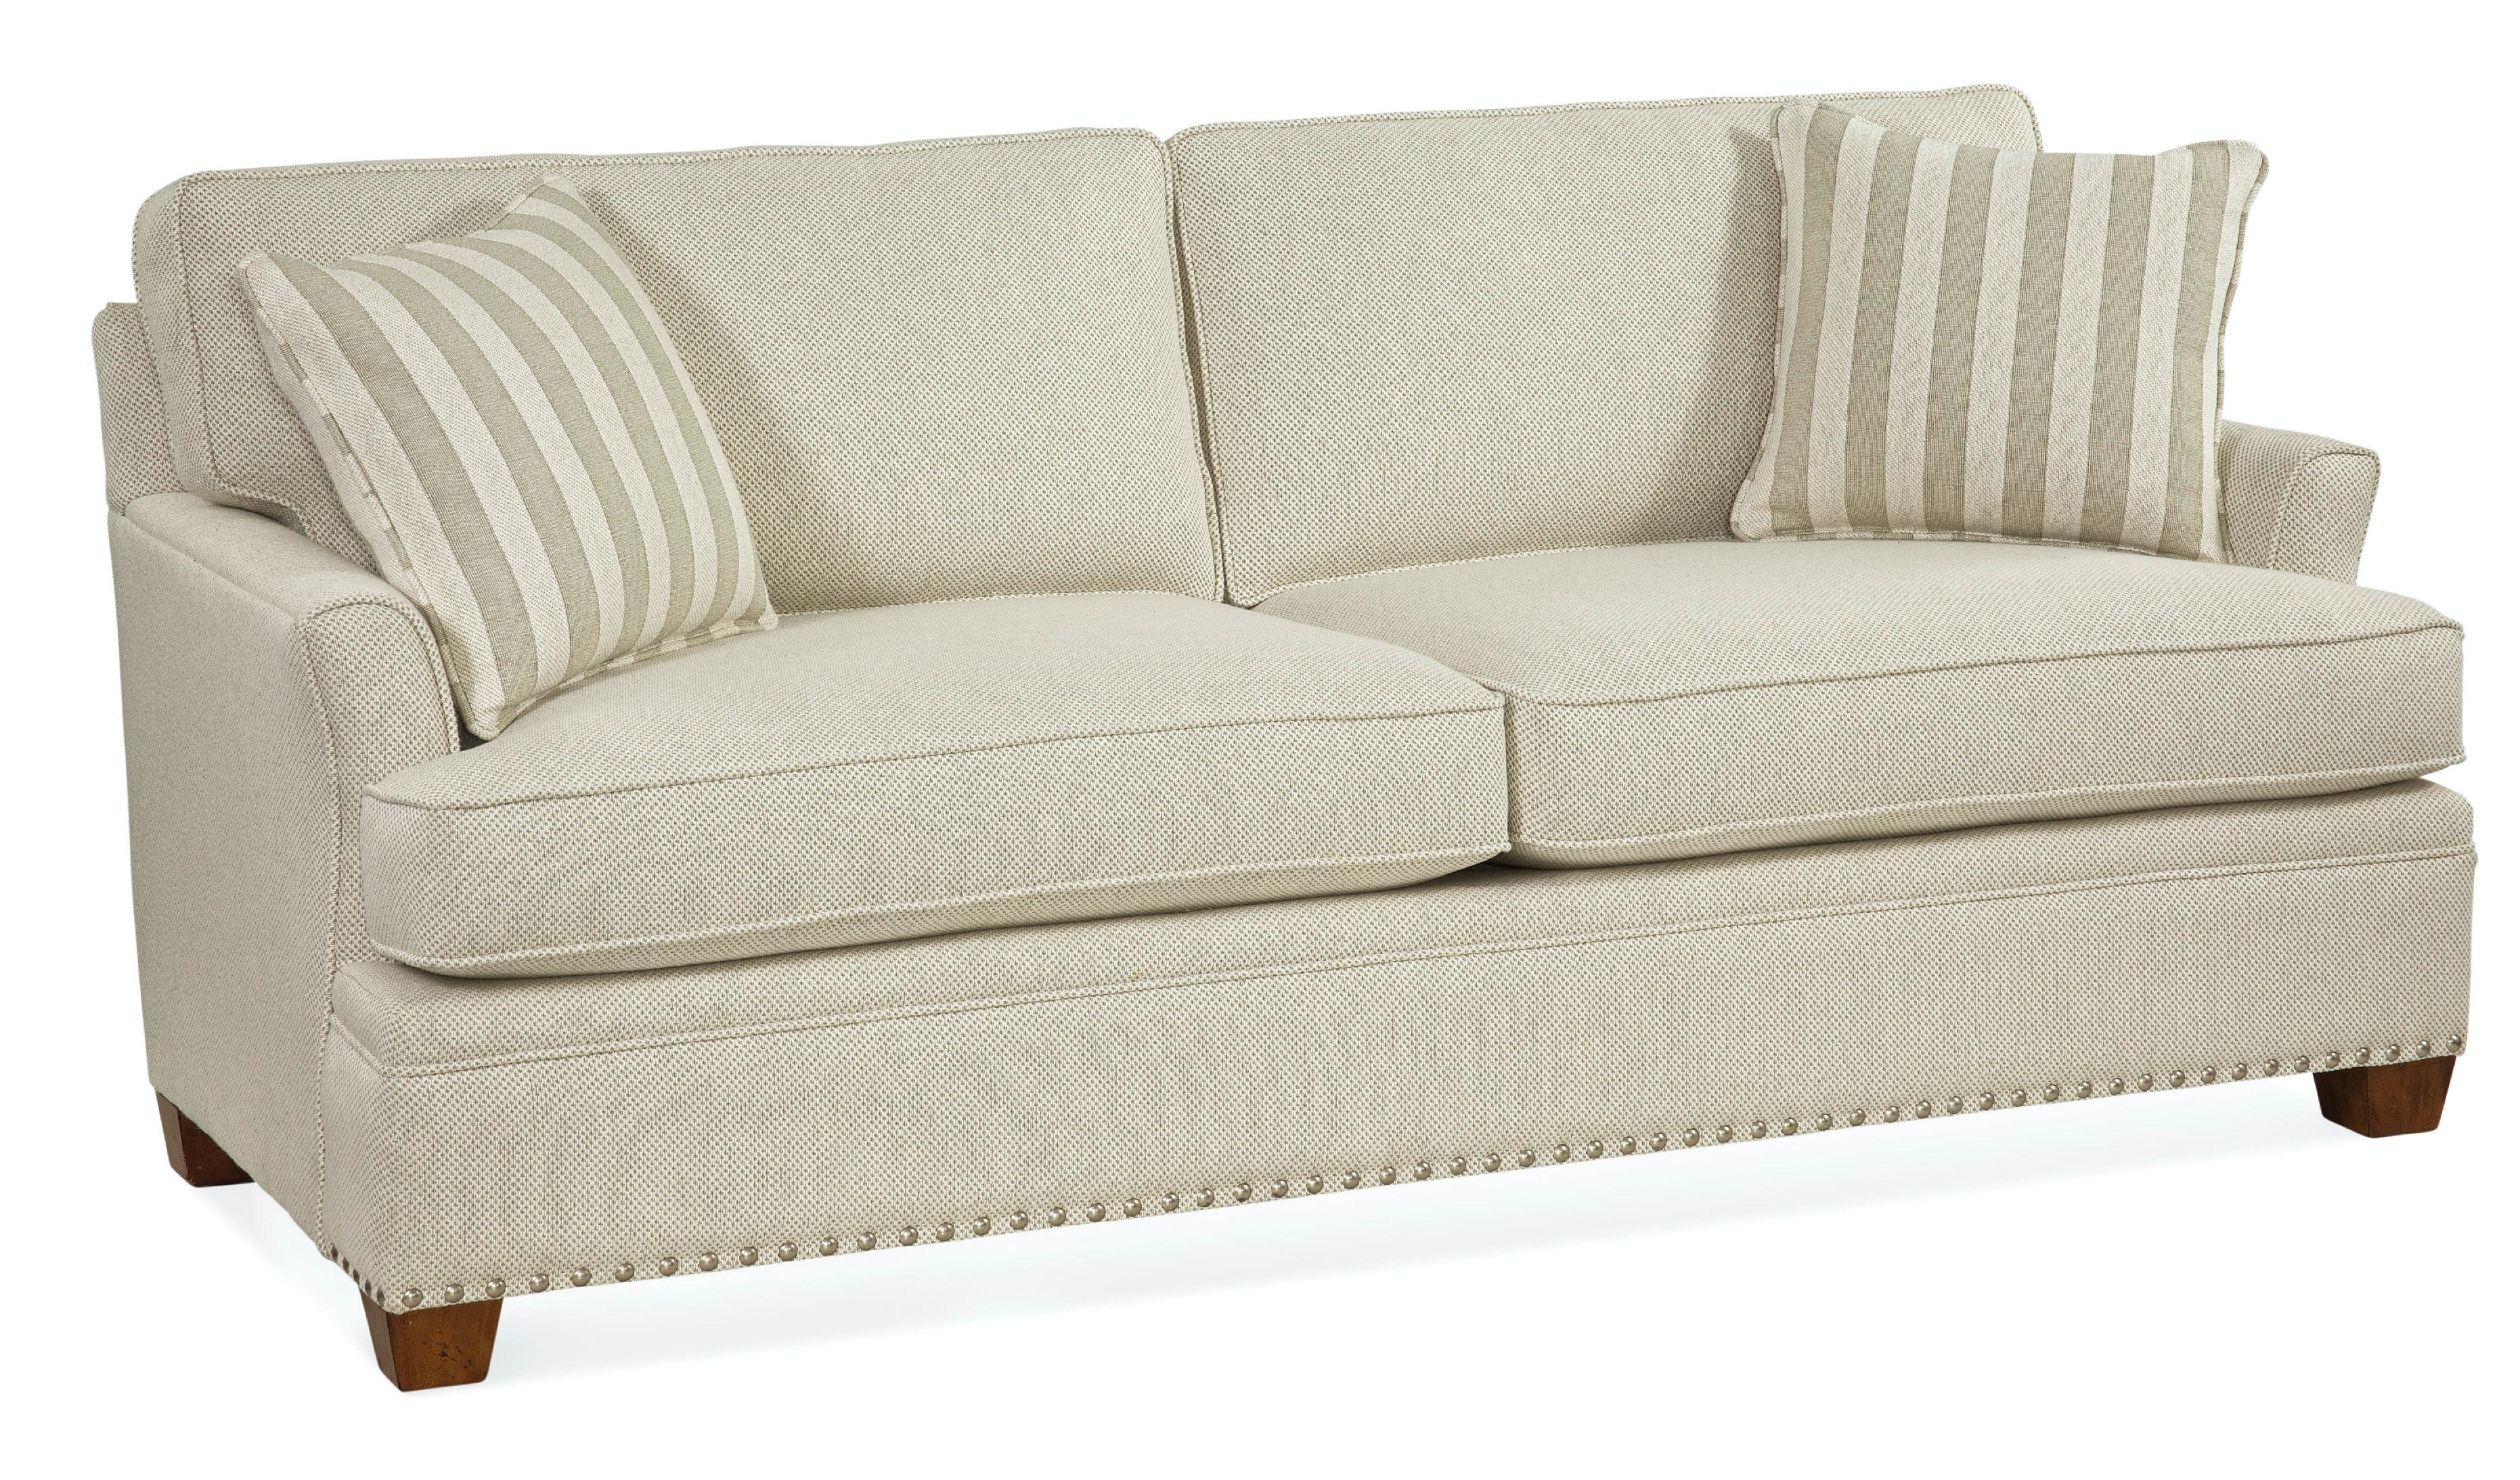 Braxton Culler Greenwich Sofa With Nailhead 756 011LN